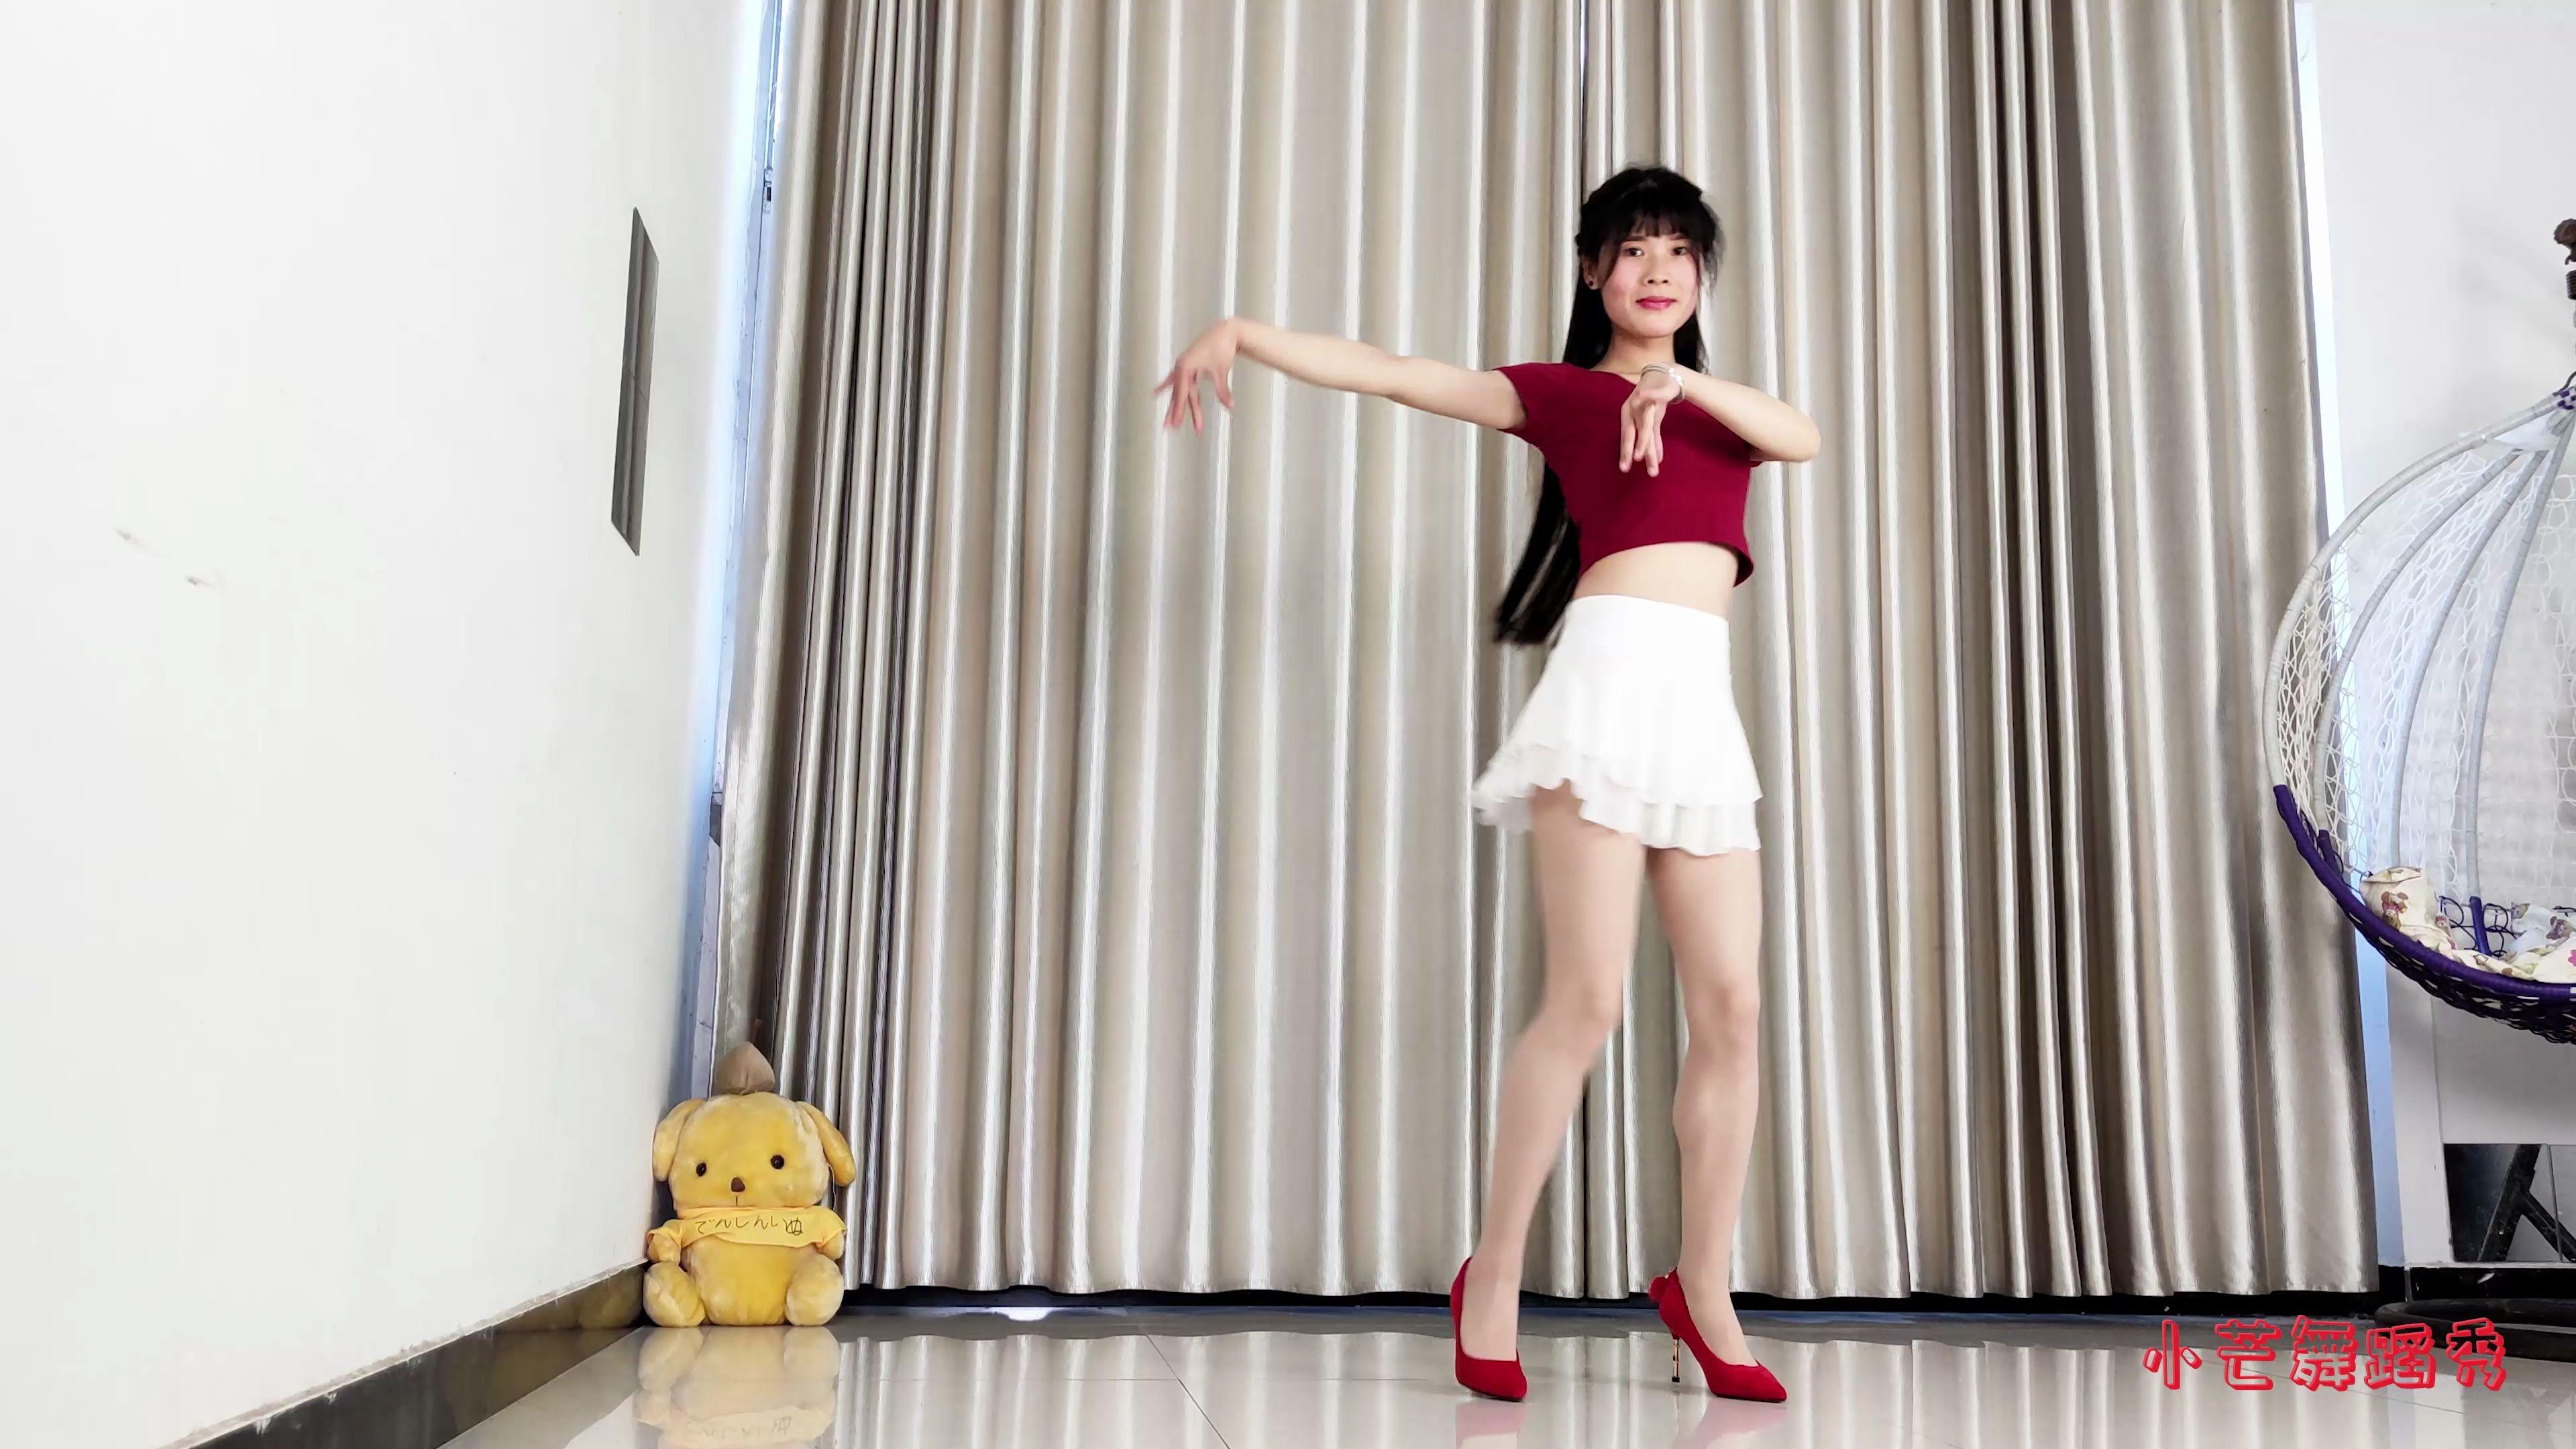 爱投罗网舞蹈教学_小芒舞蹈【糊涂的蝴蝶】_哔哩哔哩 (゜-゜)つロ 干杯~-bilibili